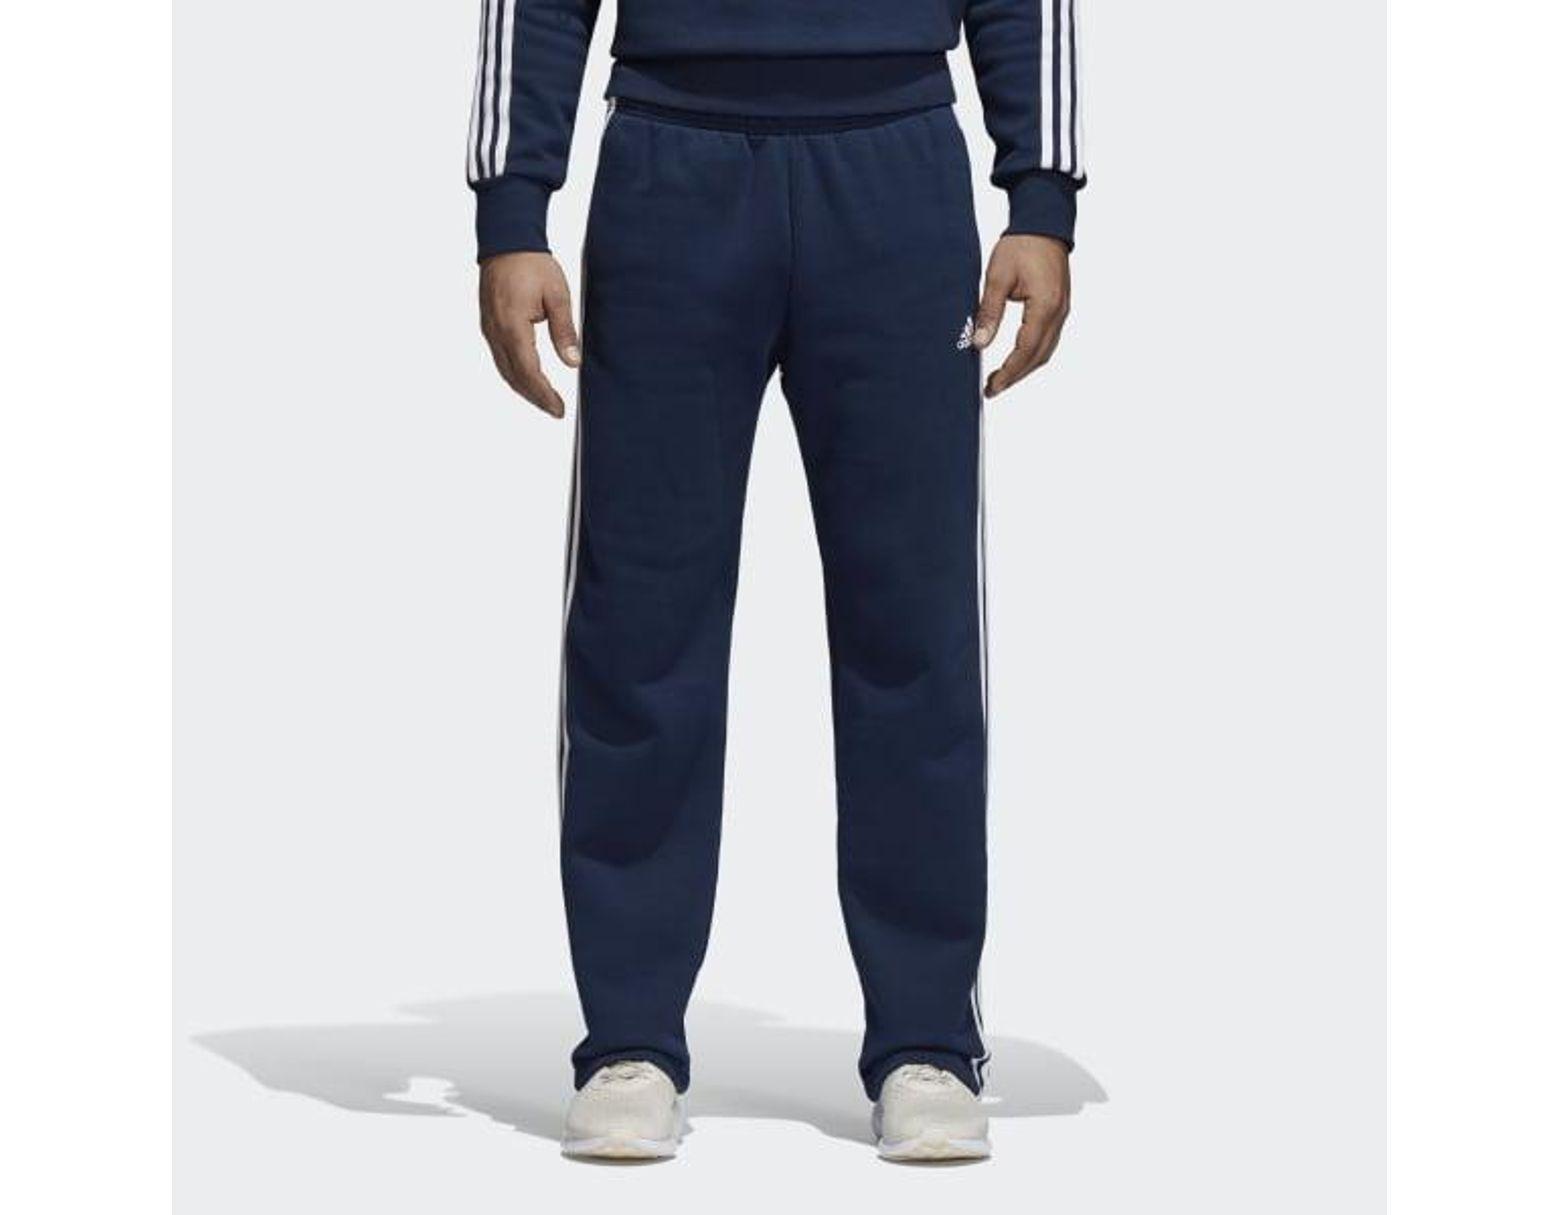 df4a5dbee6a7b3 adidas Essentials 3-stripes Fleece Pants in Blue for Men - Lyst